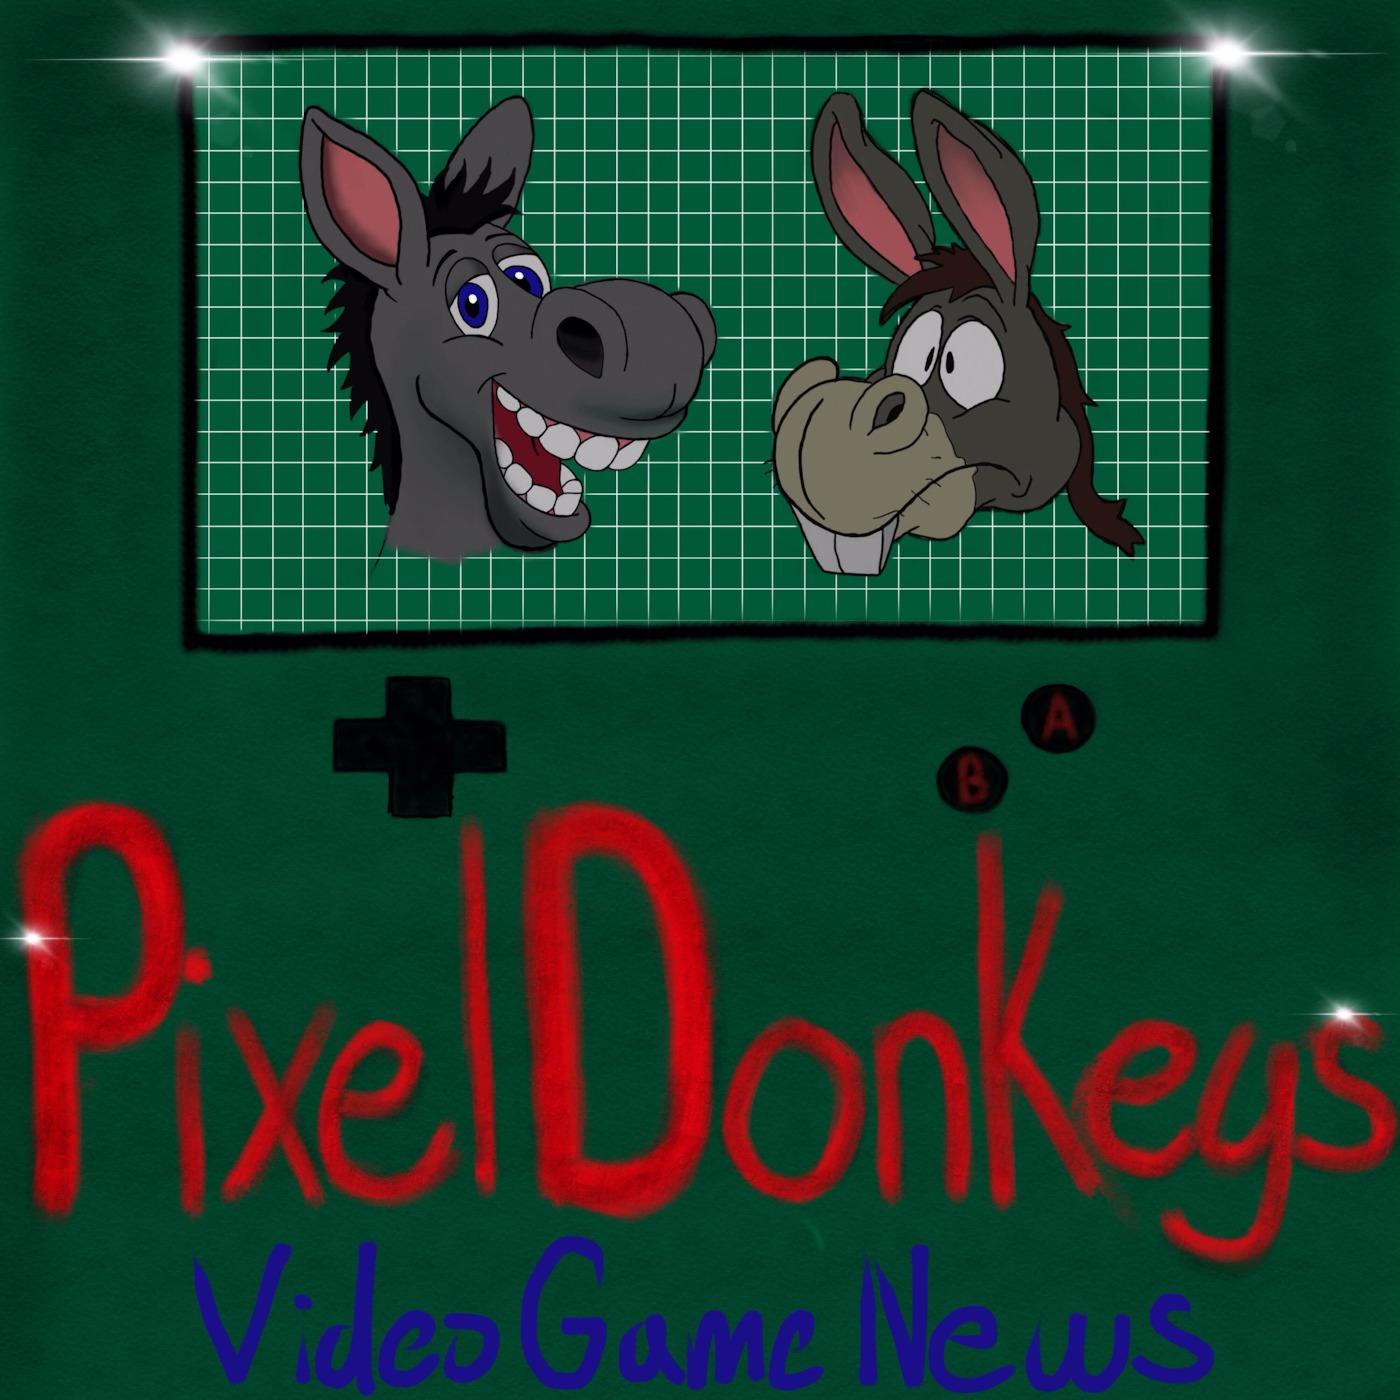 Pixel Donkeys